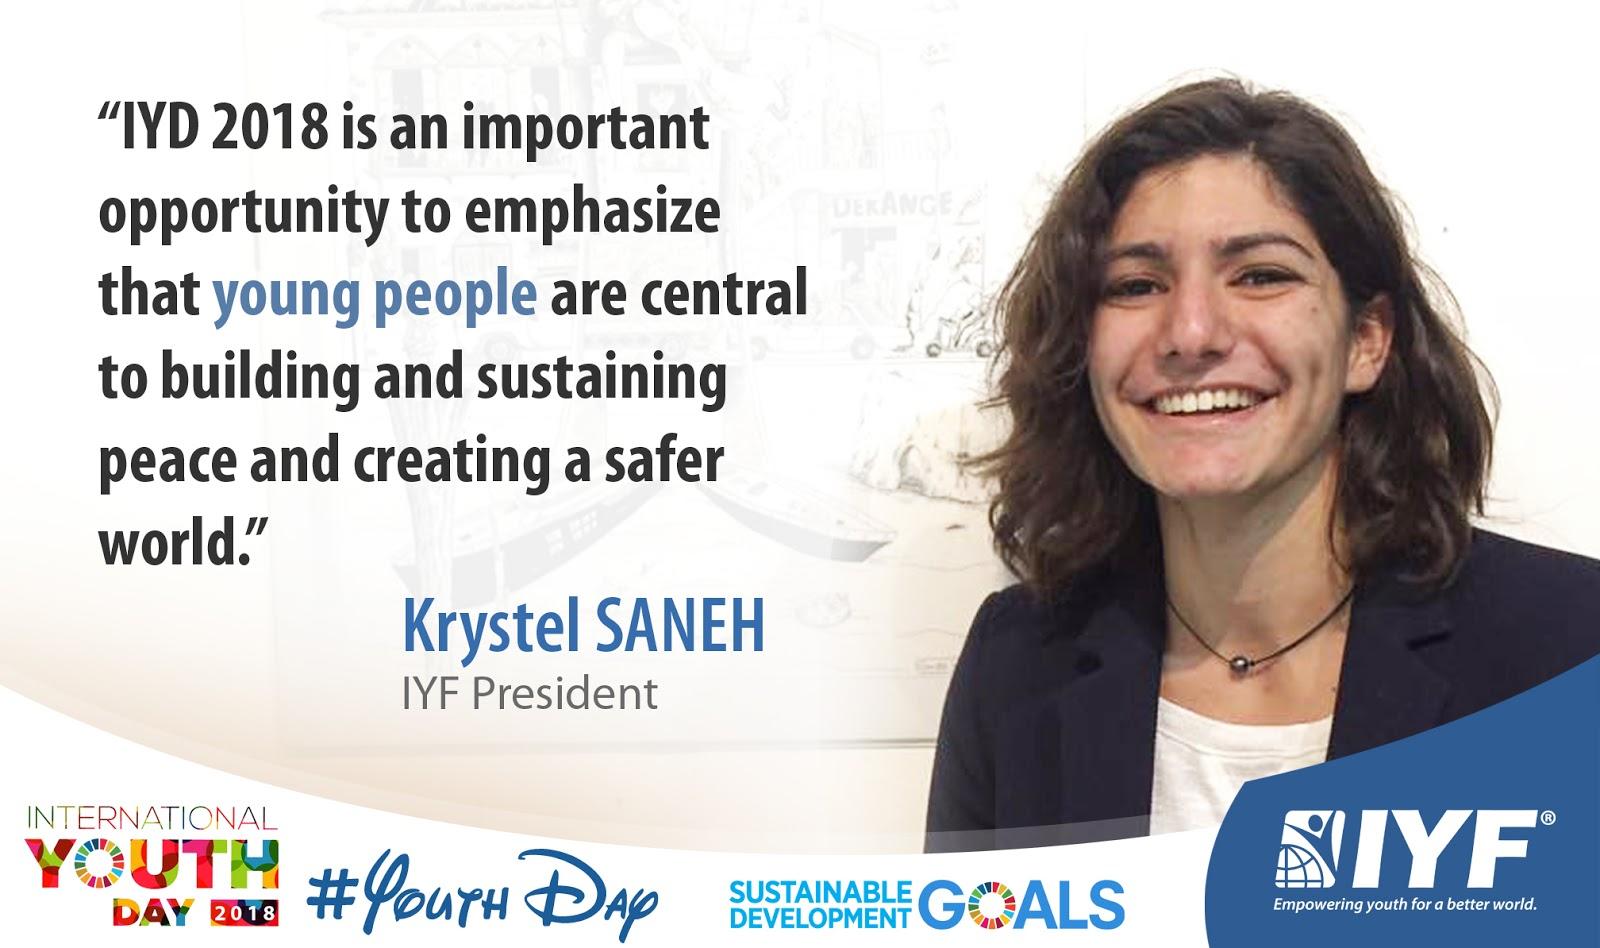 Krystel SANEH, IYF President